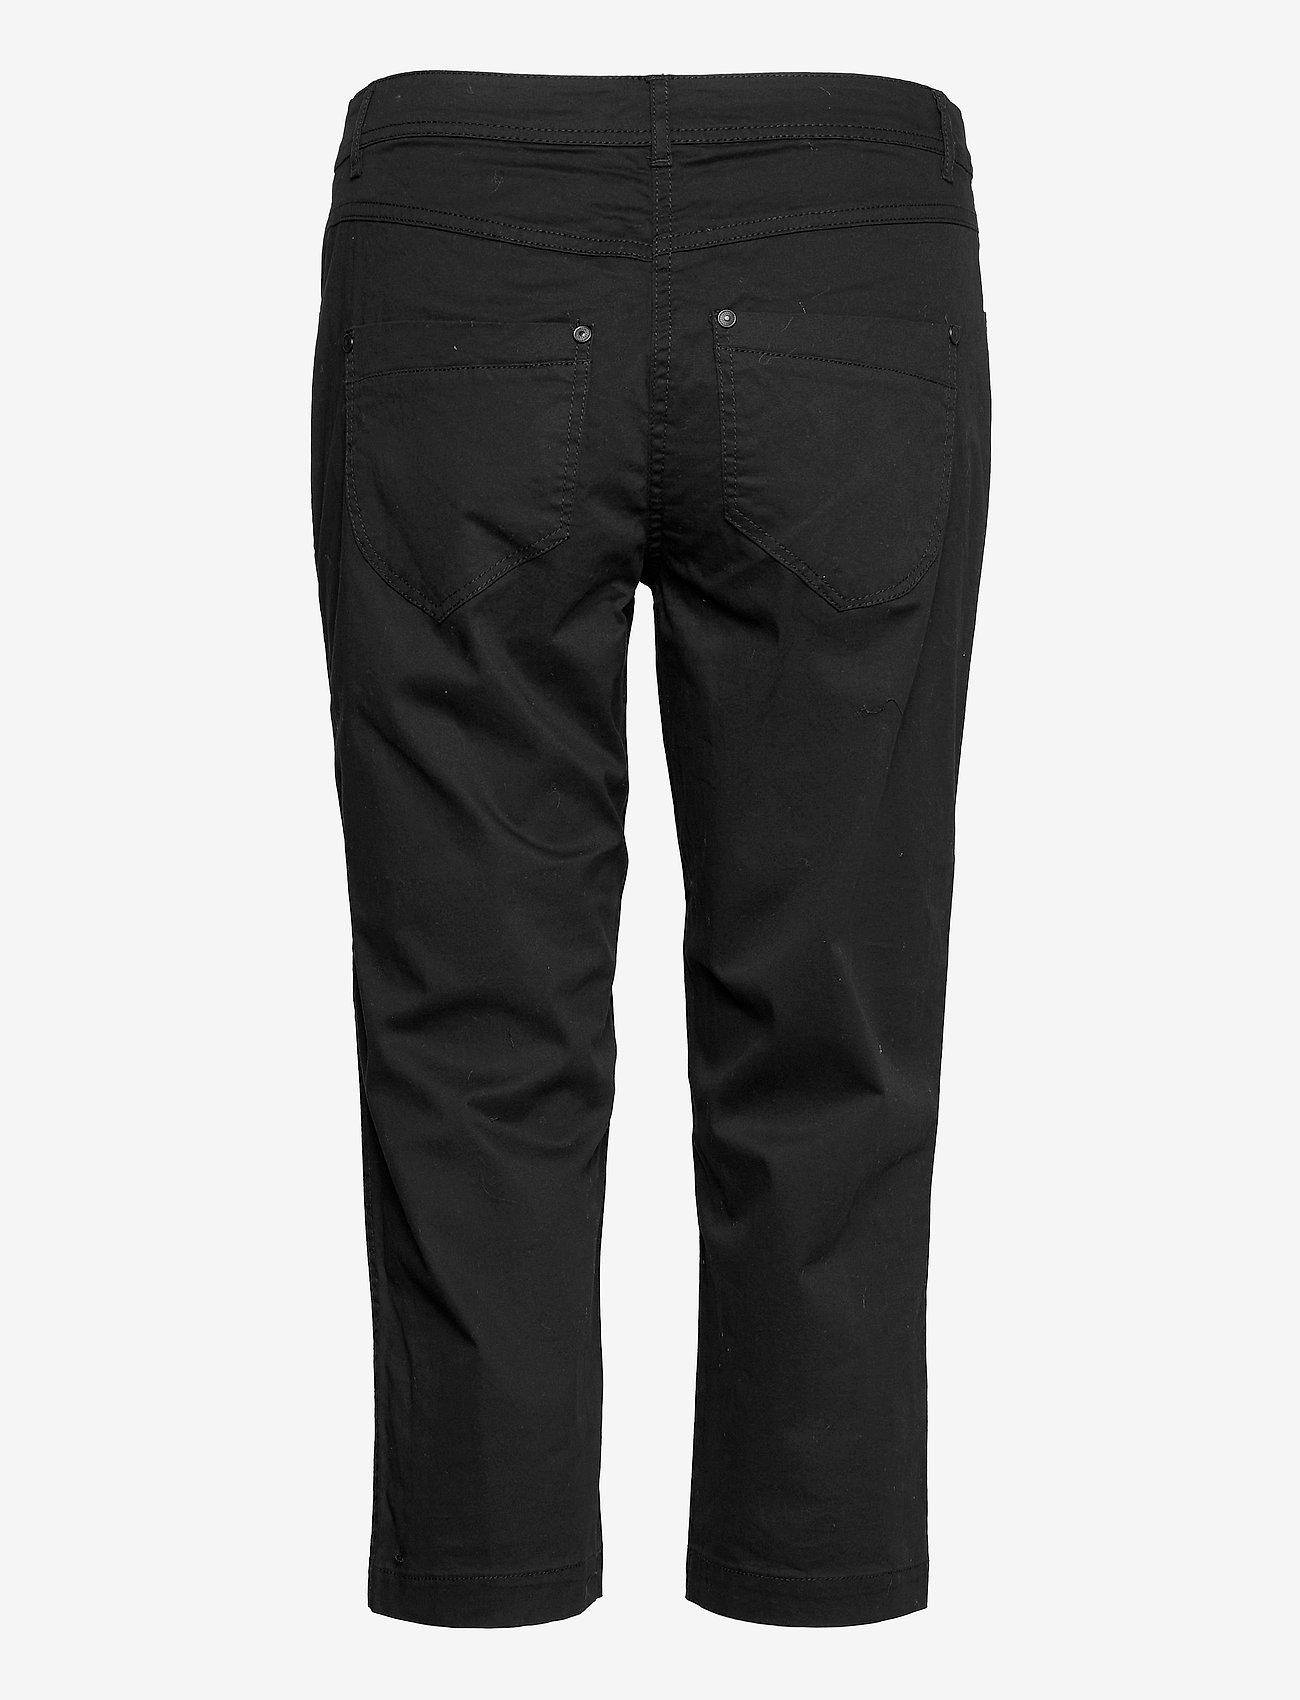 Brandtex - Capri pants - pantalons capri - black - 1